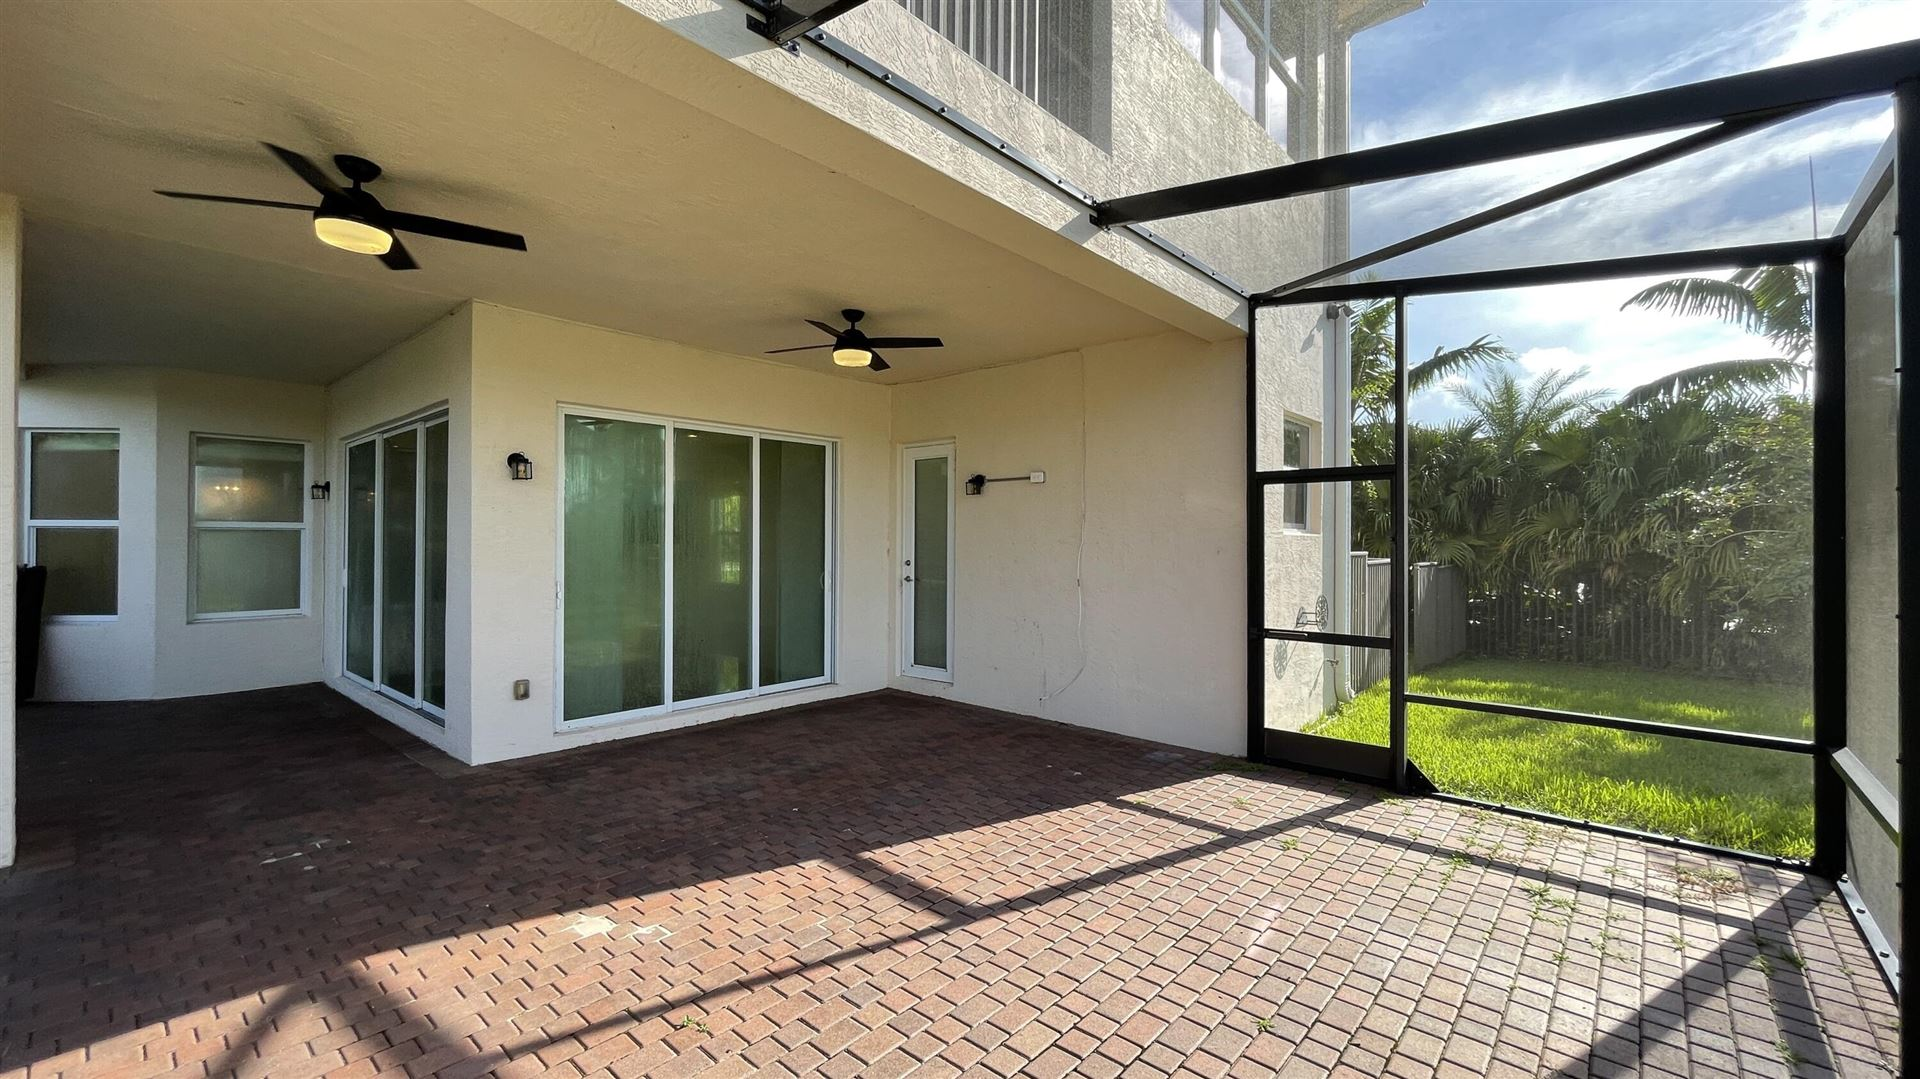 Photo of 11102 Rockledge View Drive, Palm Beach Gardens, FL 33412 (MLS # RX-10747260)